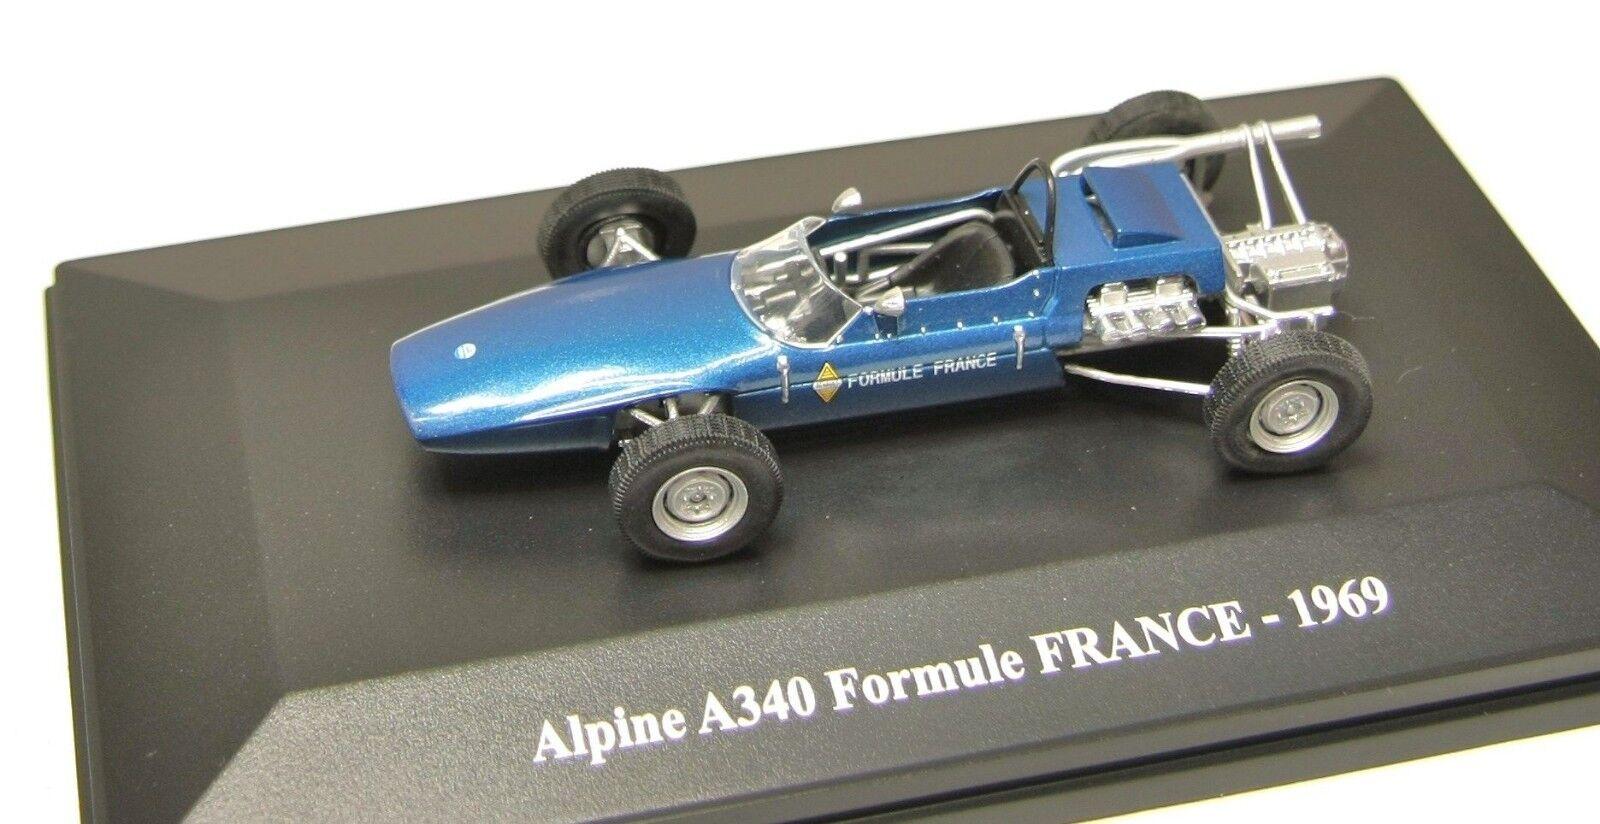 ALPINE A340 FORMULE FRANCE 1969 ELIGOR 1 43 HACHETTE FORMULA blue blue